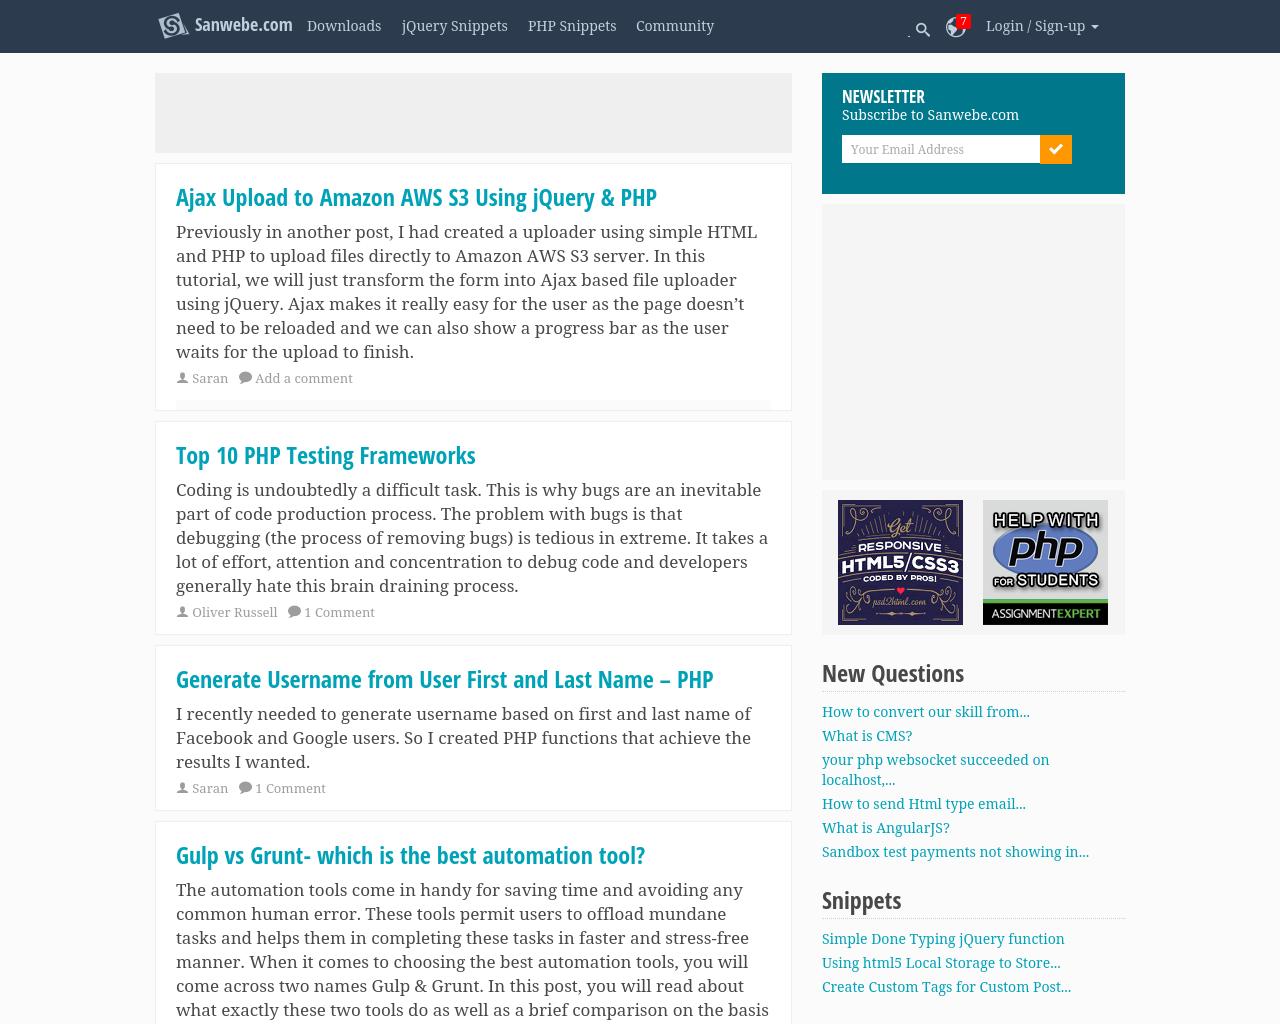 Sanwebe.com-Advertising-Reviews-Pricing